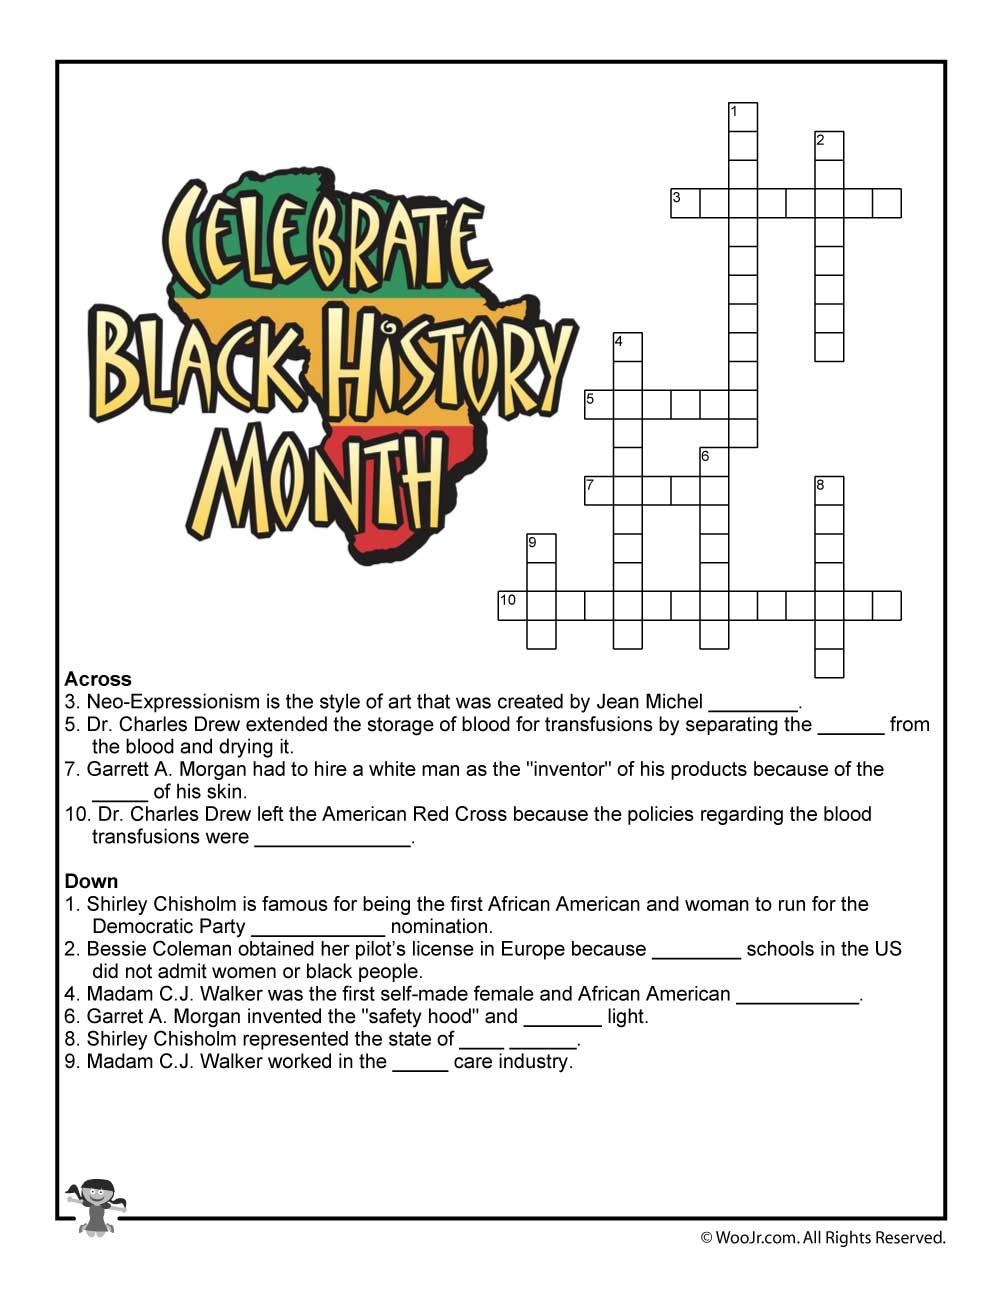 Black History Month Crossword Puzzle Worksheet   Woo! Jr. Kids - Printable History Puzzles